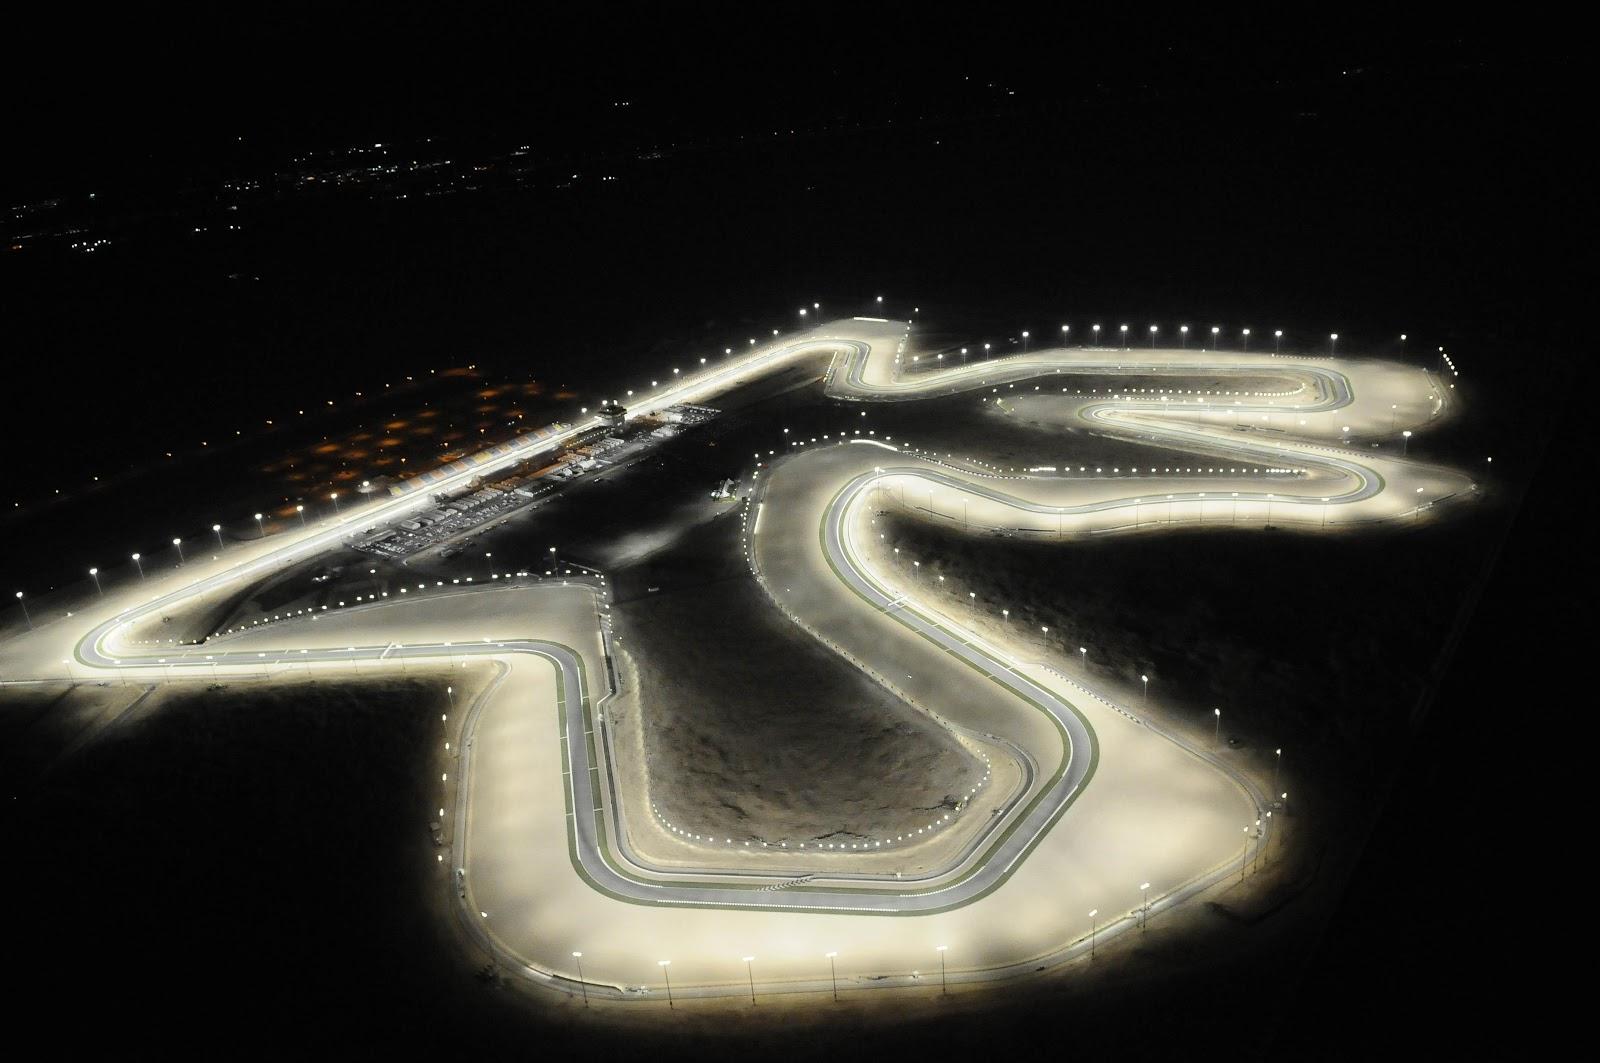 Grand Prix® van Qatar - Doha 2021